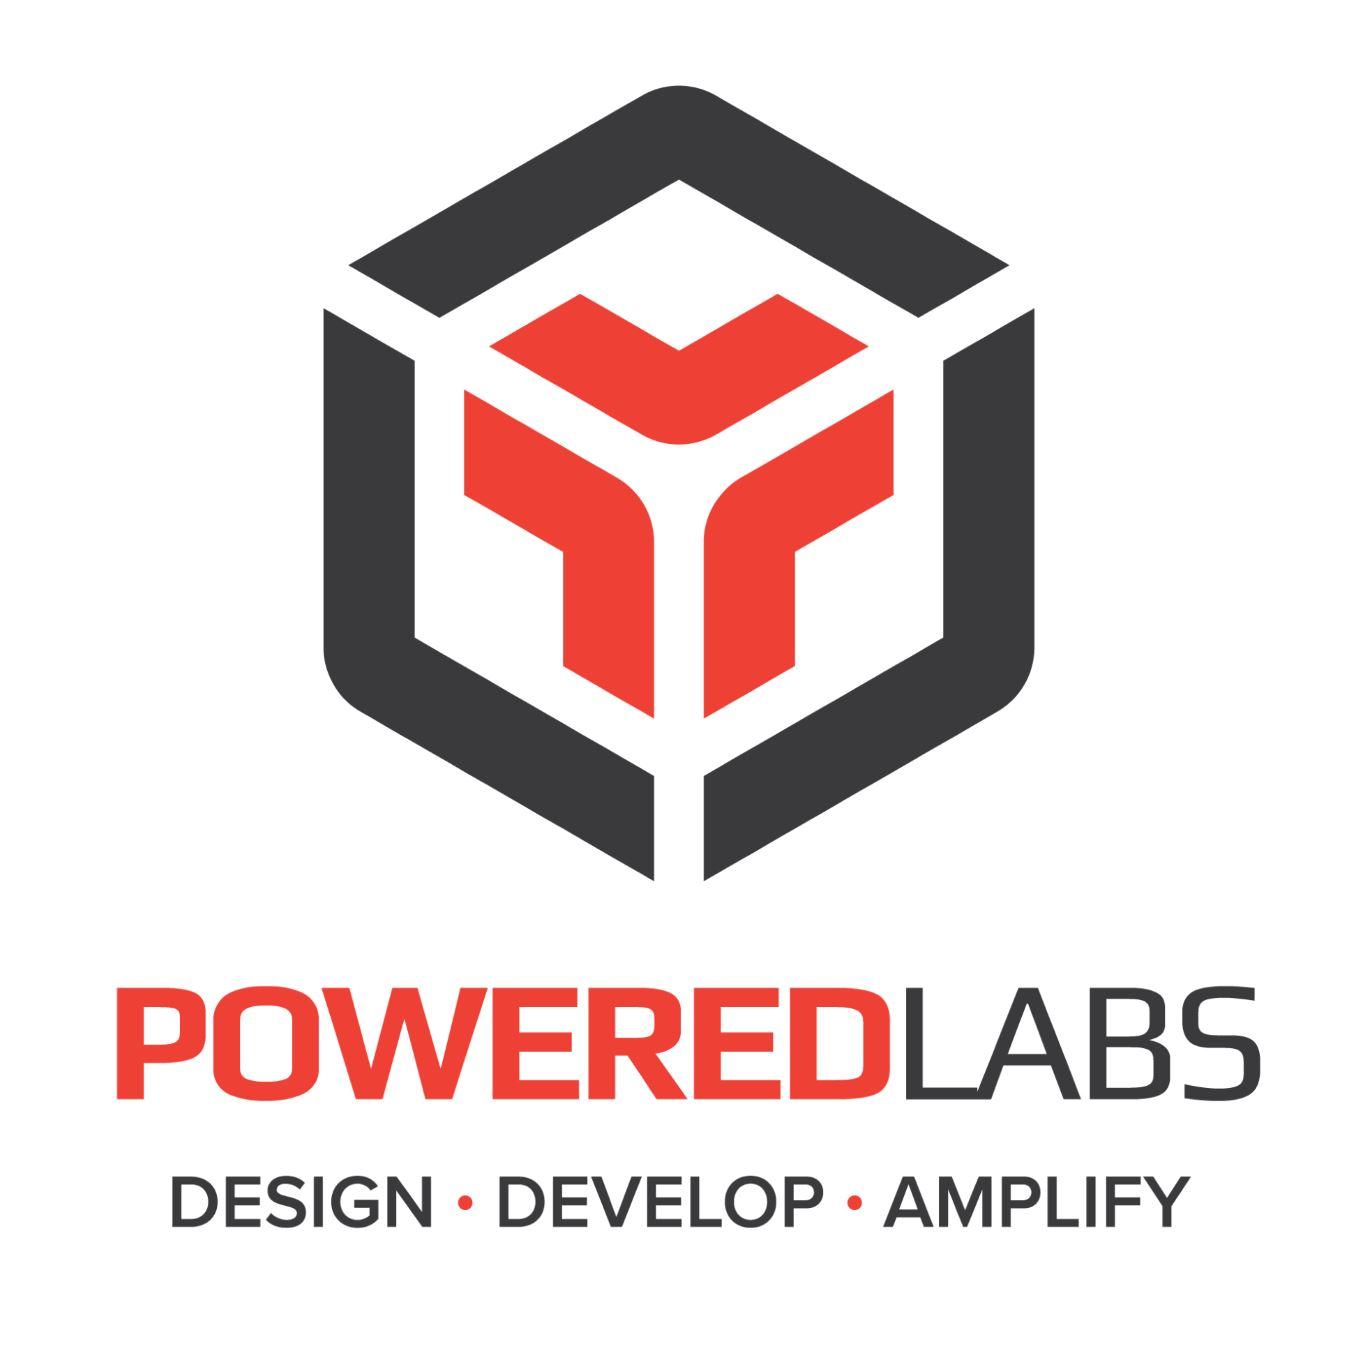 poweredlabs Logo